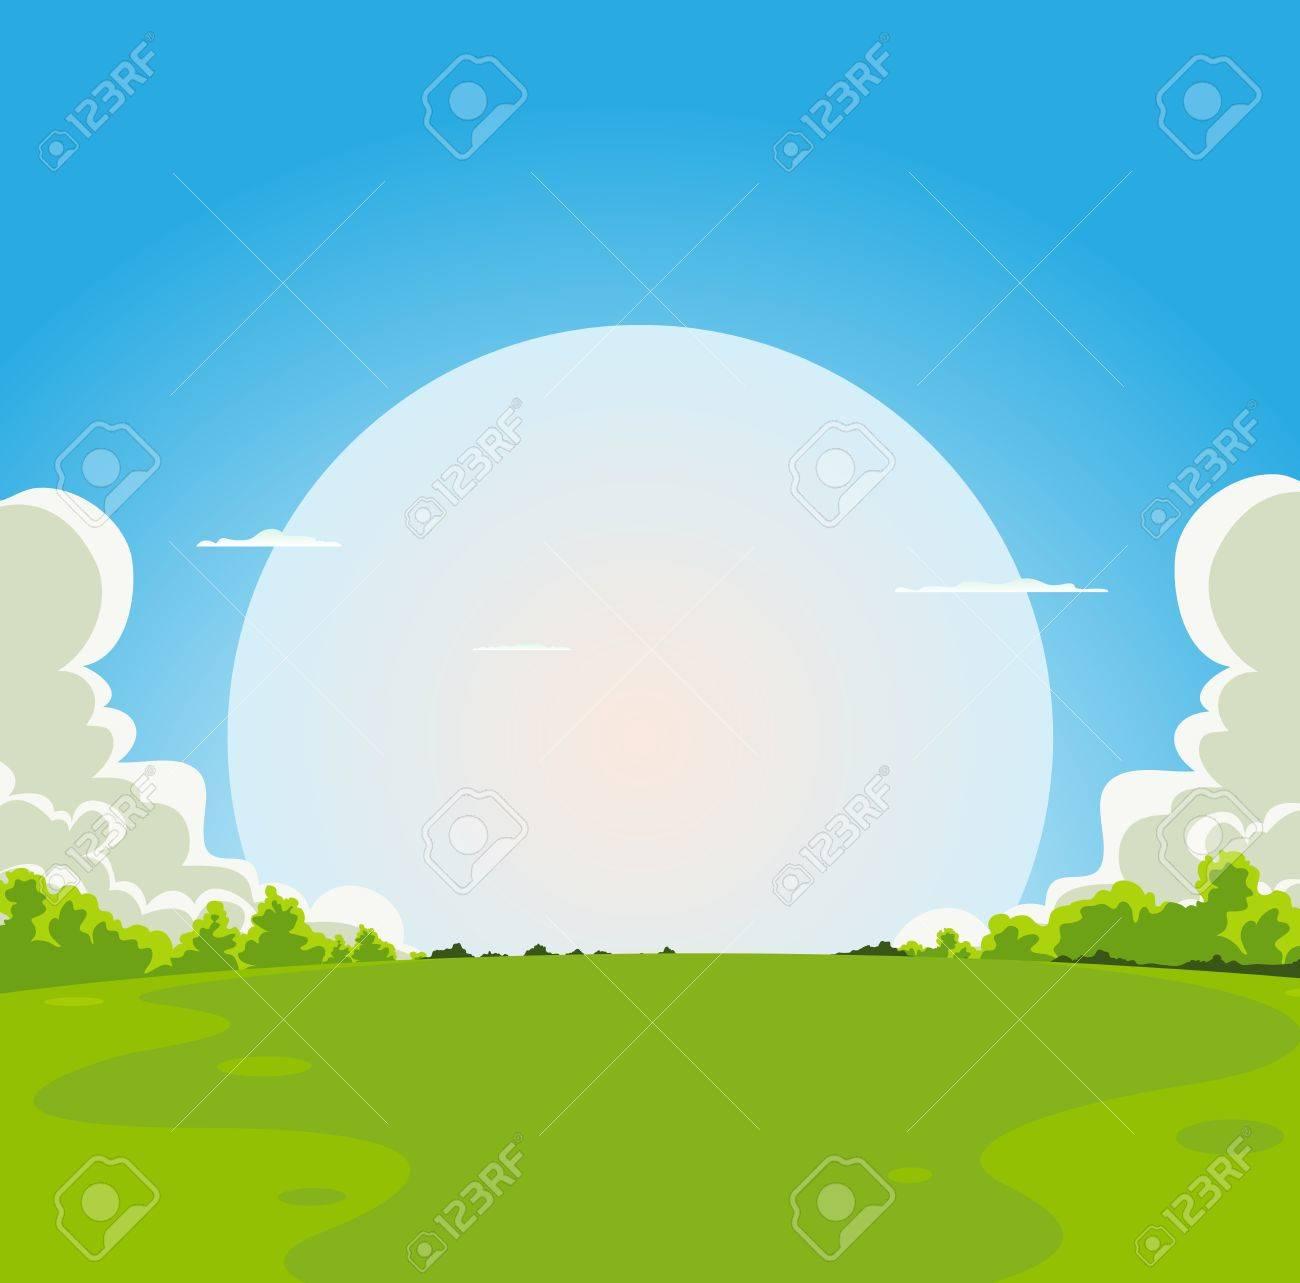 Illustration of a cartoon moon rising under spring fields landscape - 11841729